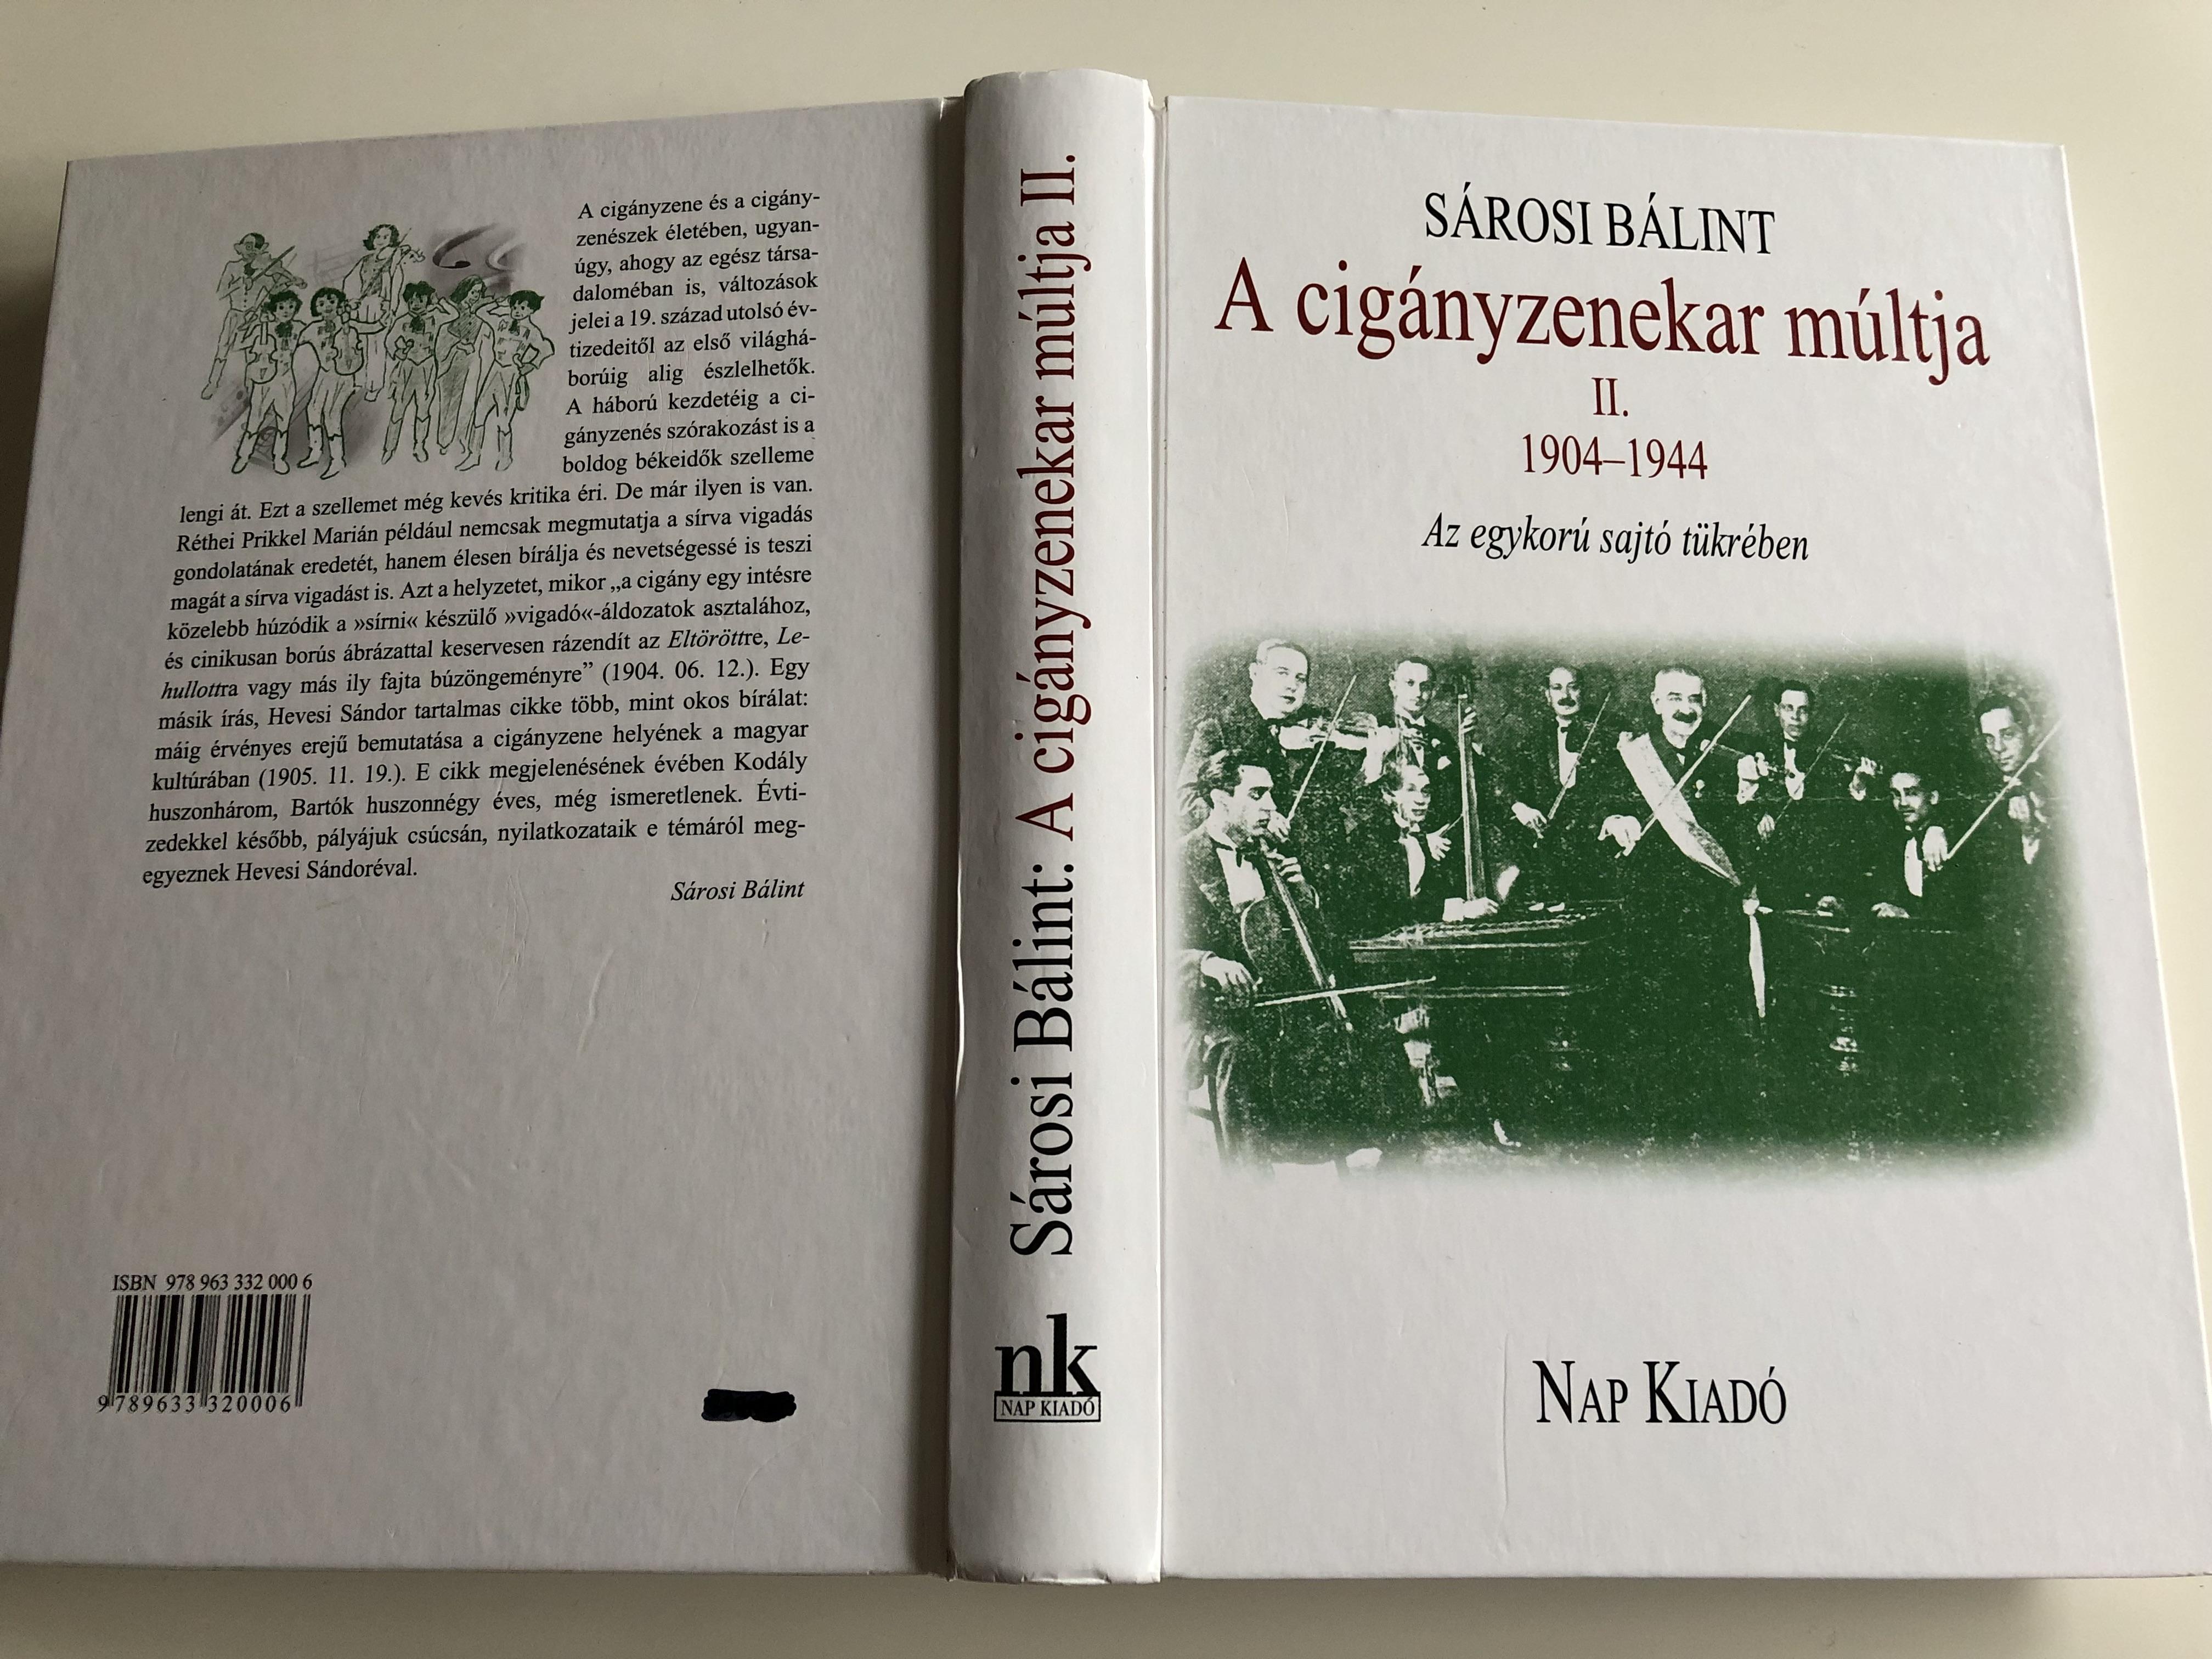 a-cig-nyzenekar-m-ltja-ii-1904-1944-by-s-rosi-b-lint-az-egykor-sajt-t-kr-ben-the-history-of-the-hungarian-gypsy-orchestra-1904-1944-nap-kiad-hardcover-2012-20-.jpg